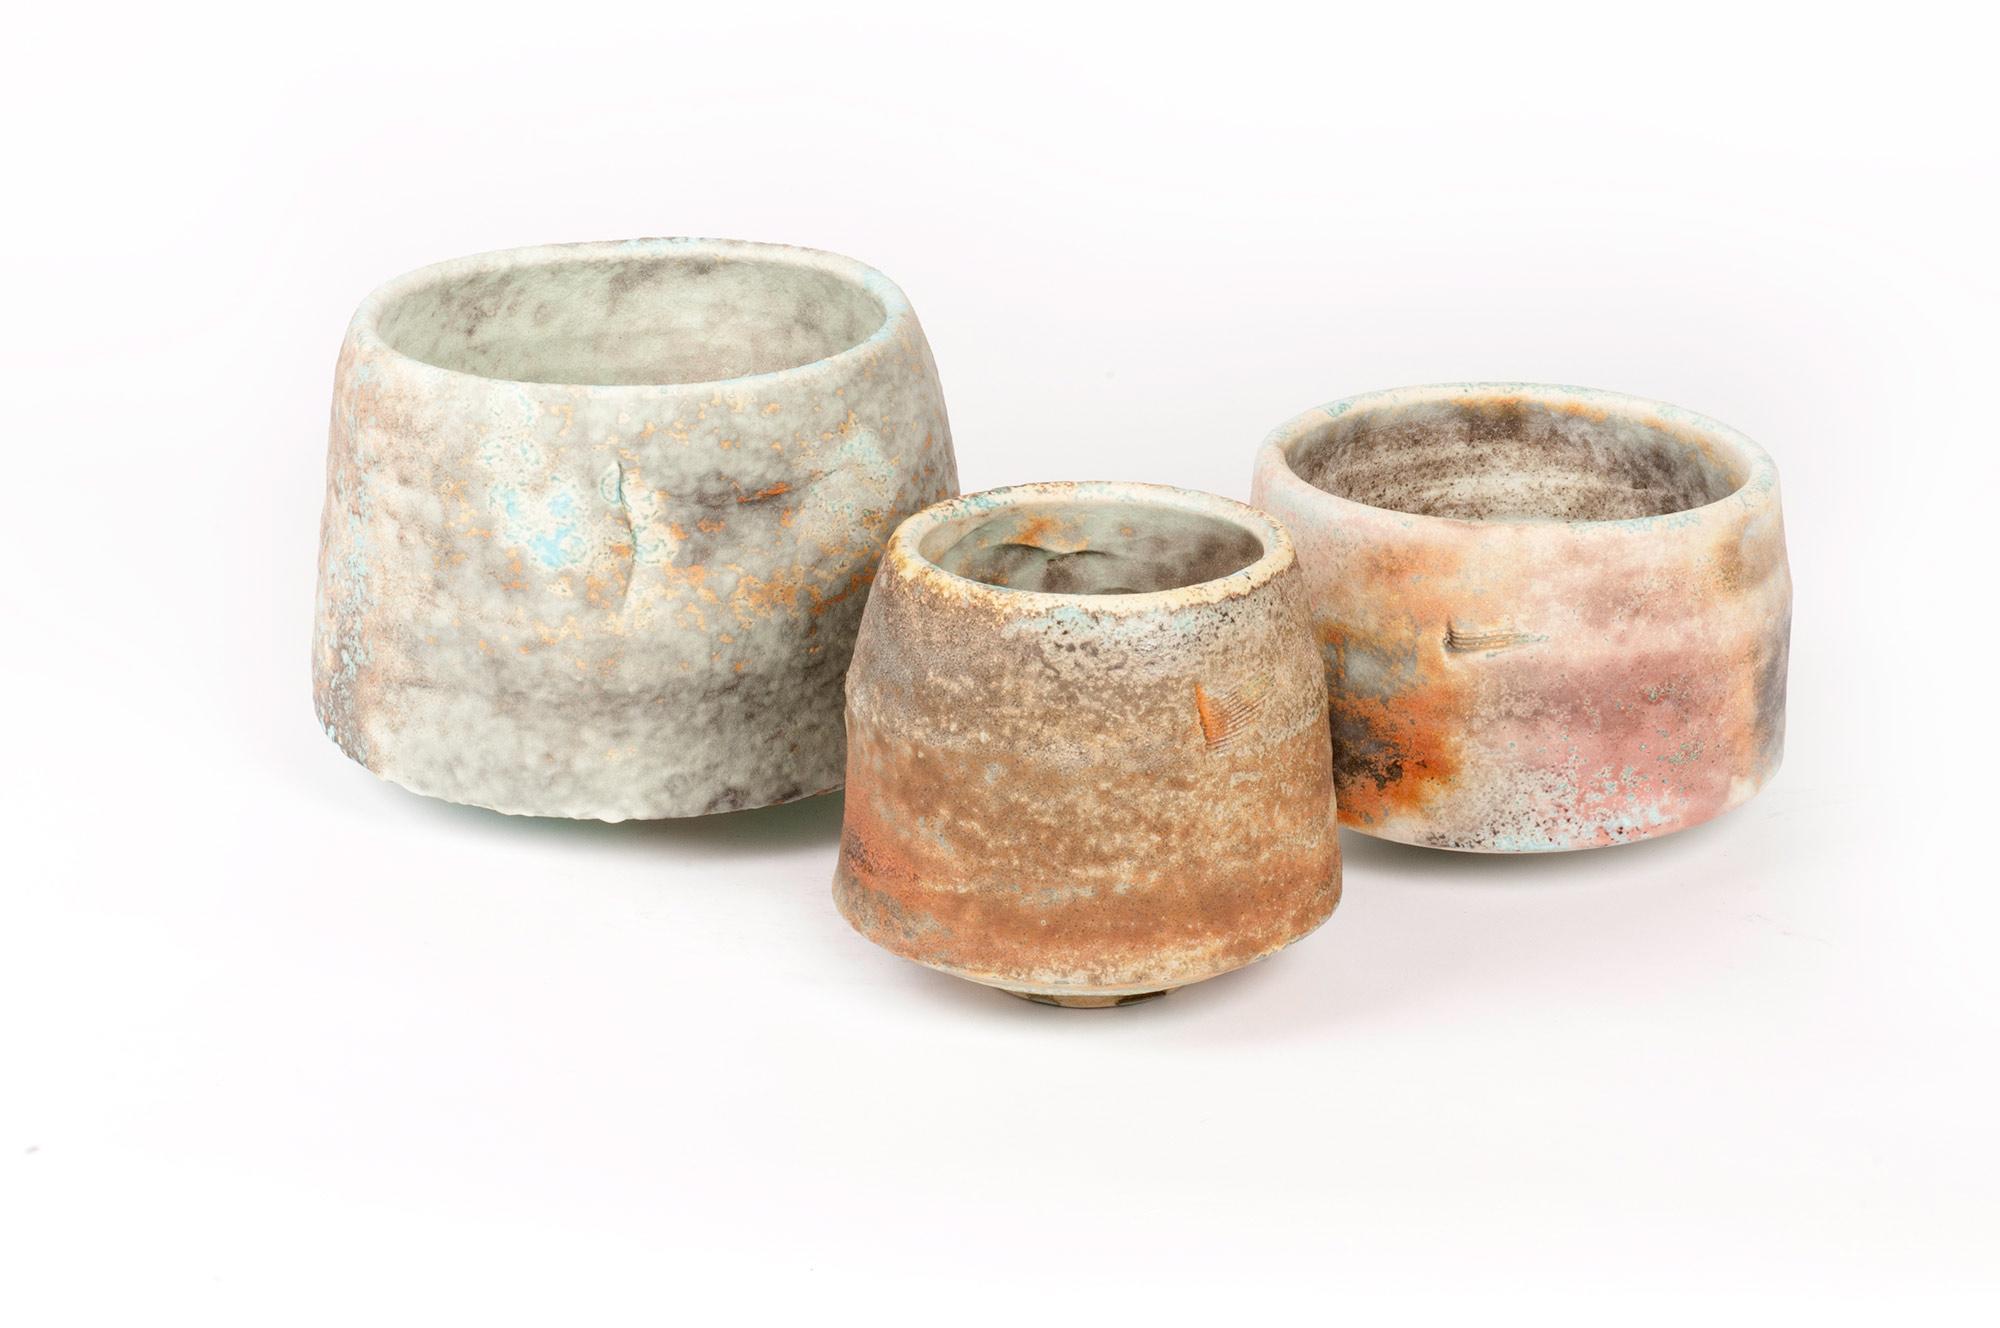 doherty-porcelain-three-carved-bowls.jpg